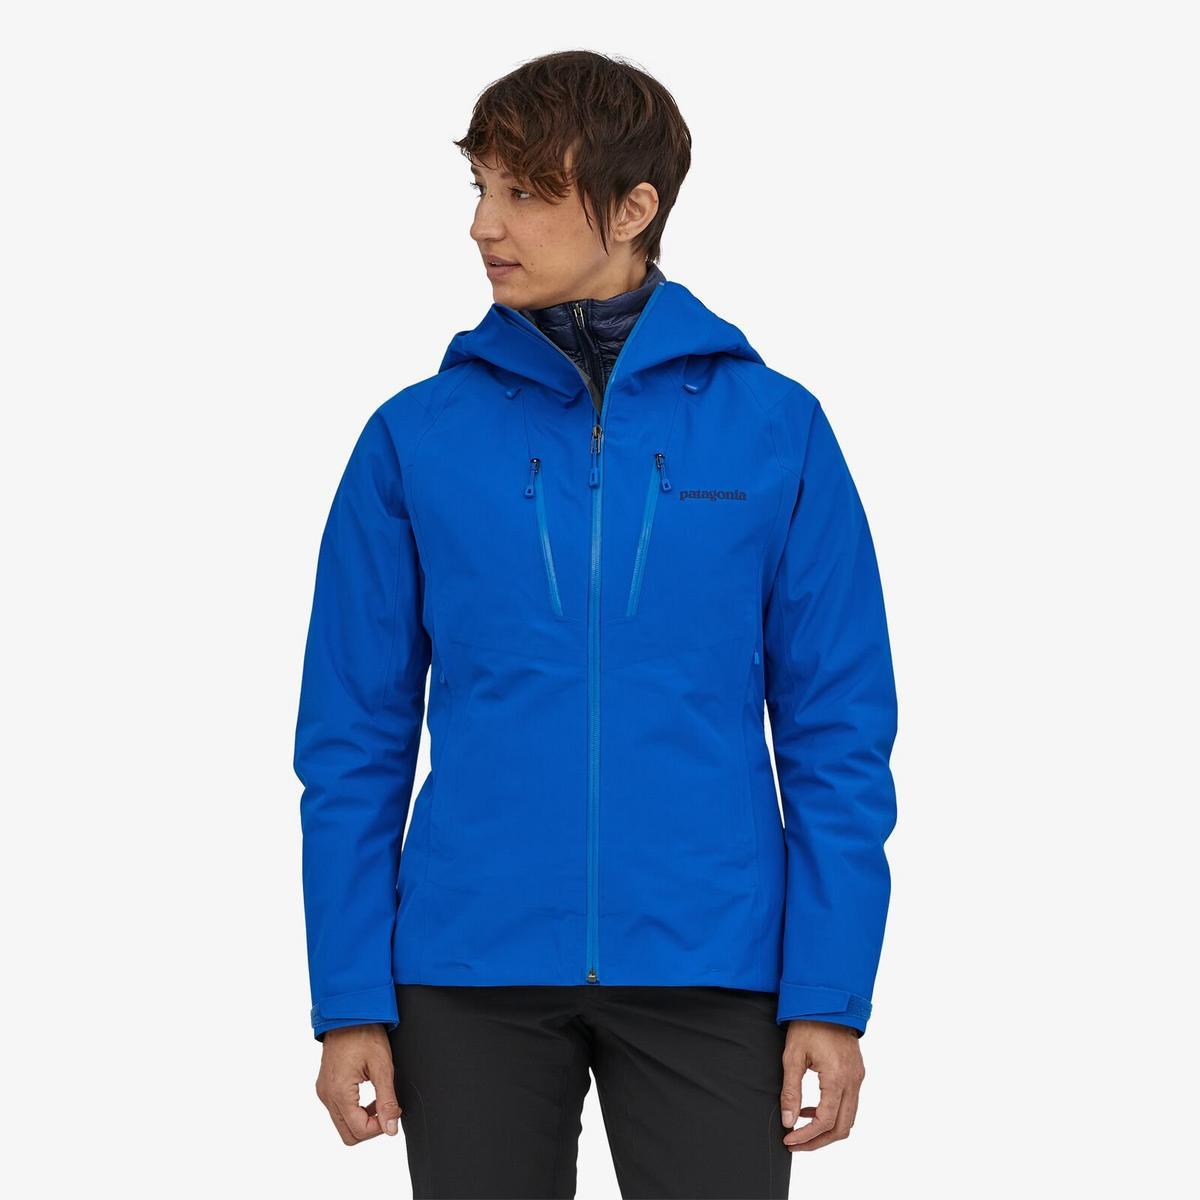 Patagonia Women's Triolet Jacket - Alpine Blue